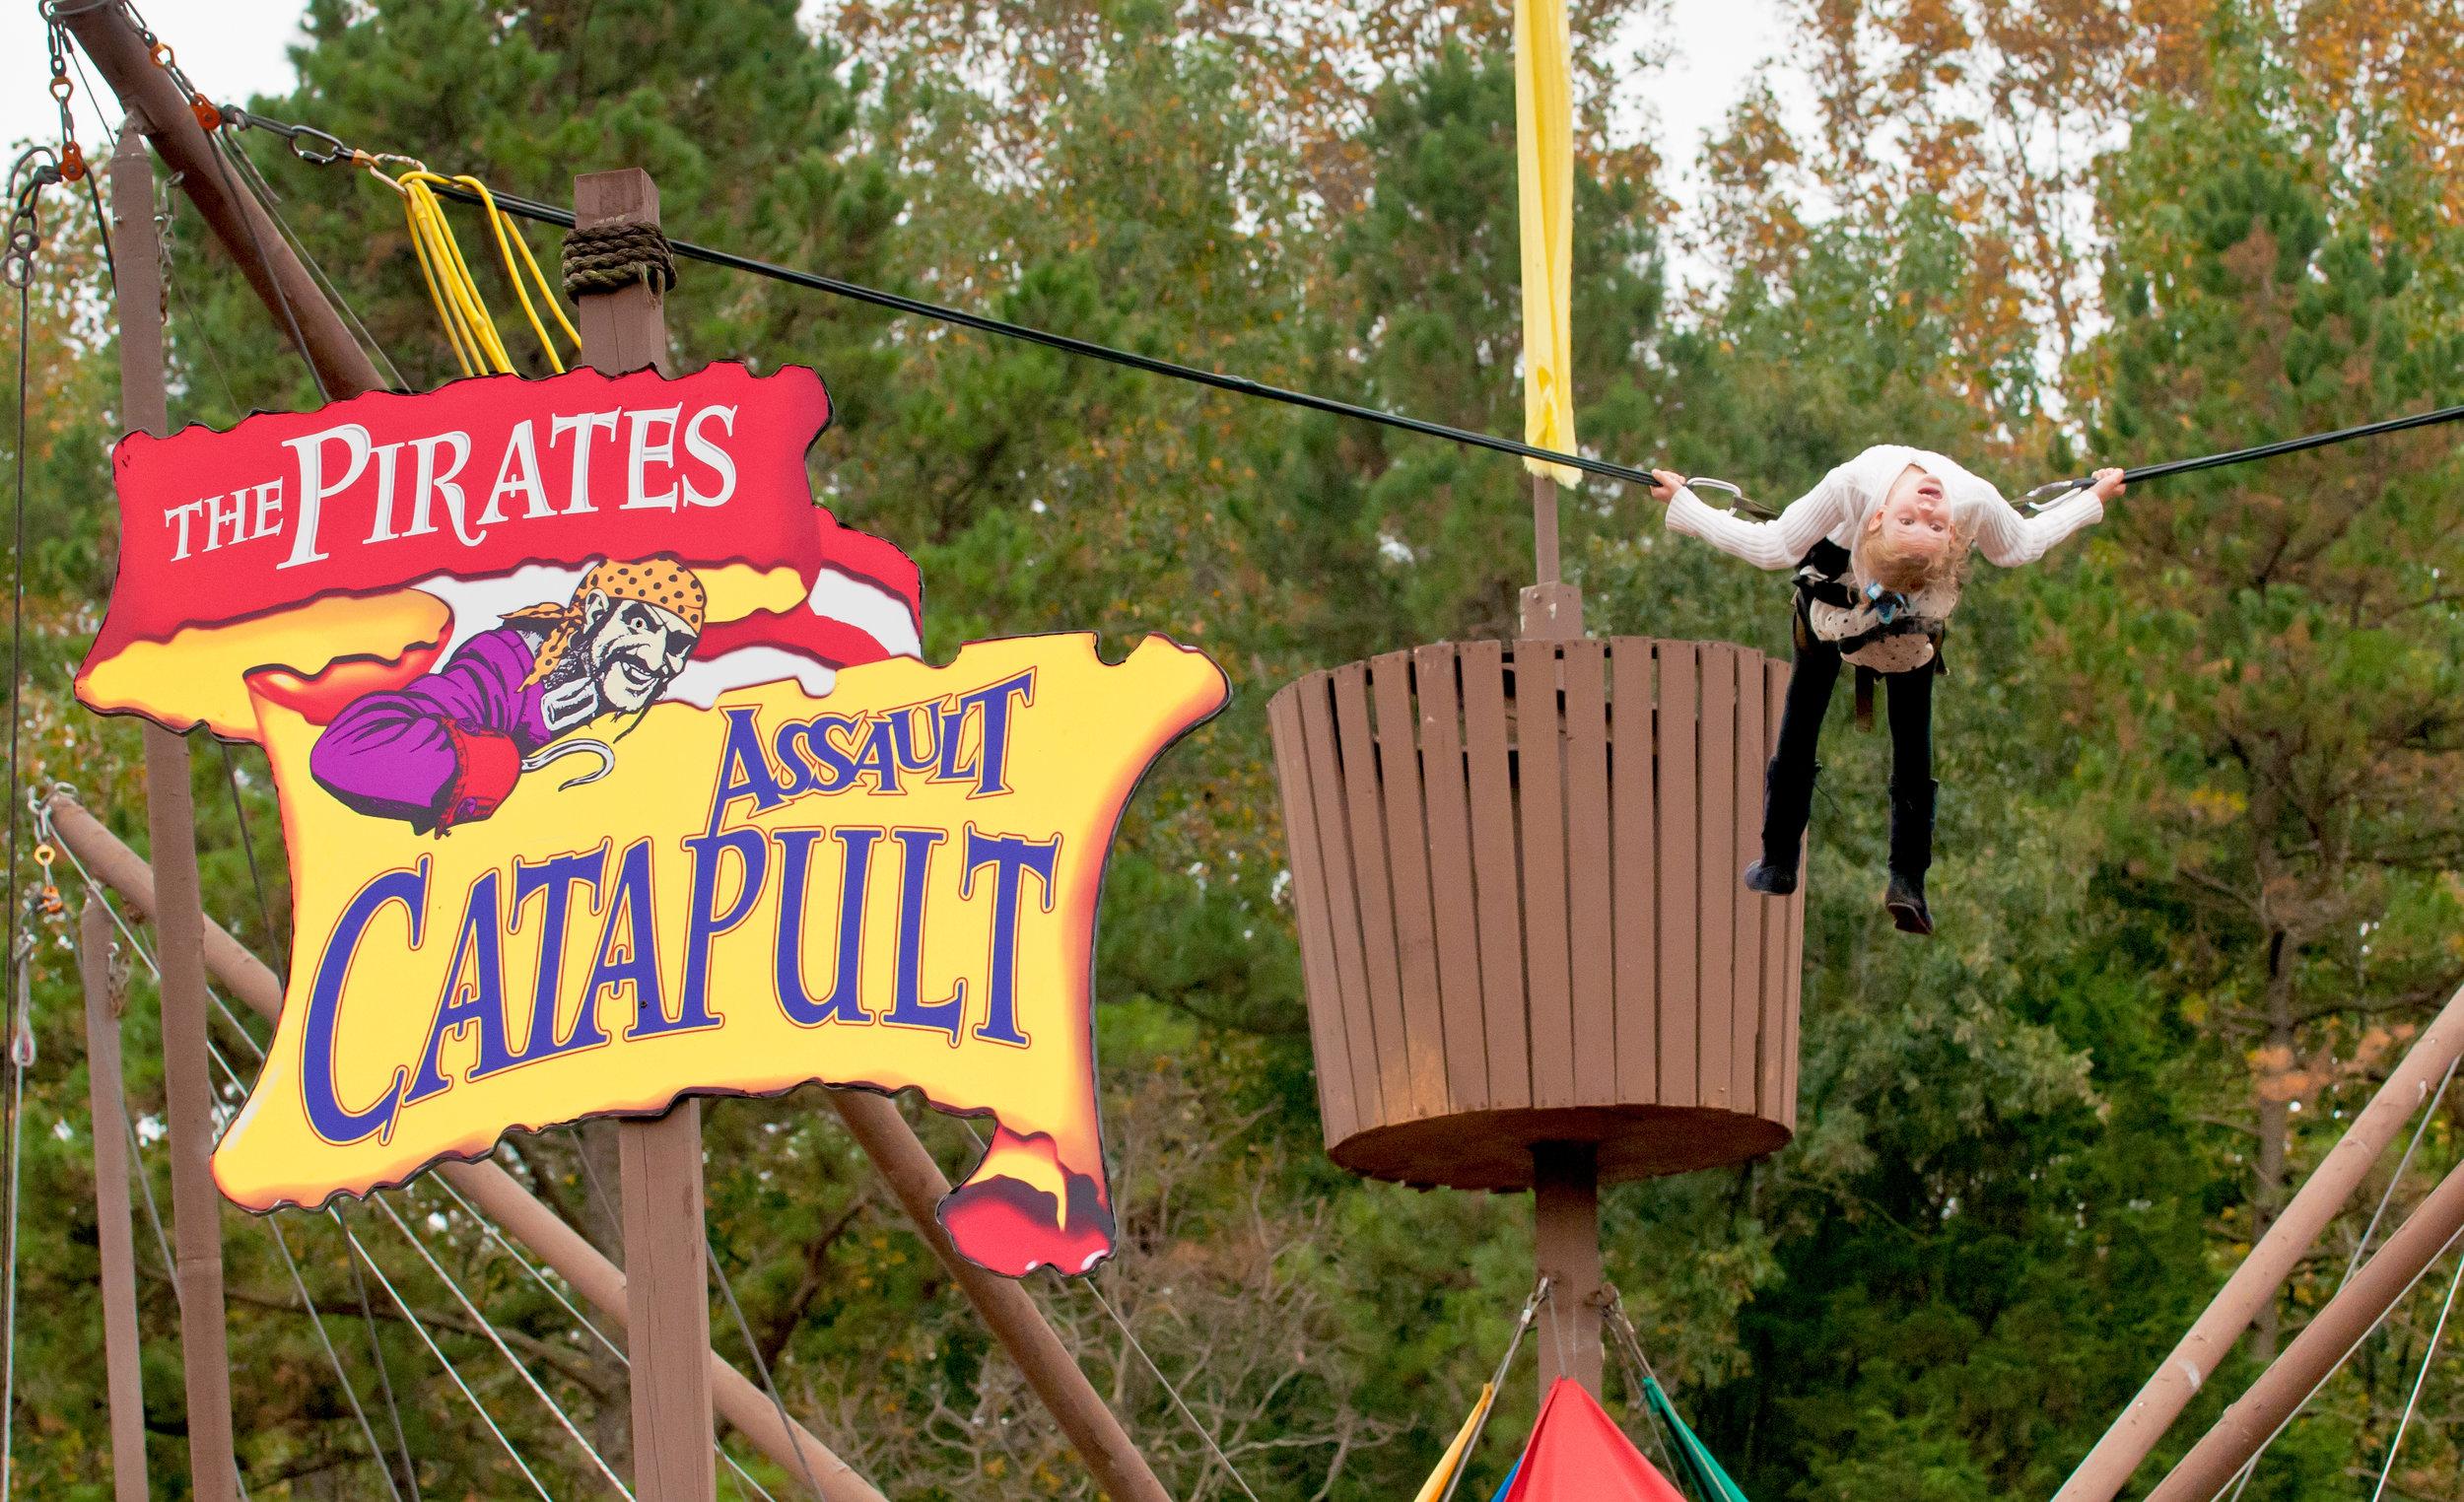 The Pirates Assault Catapult.jpg